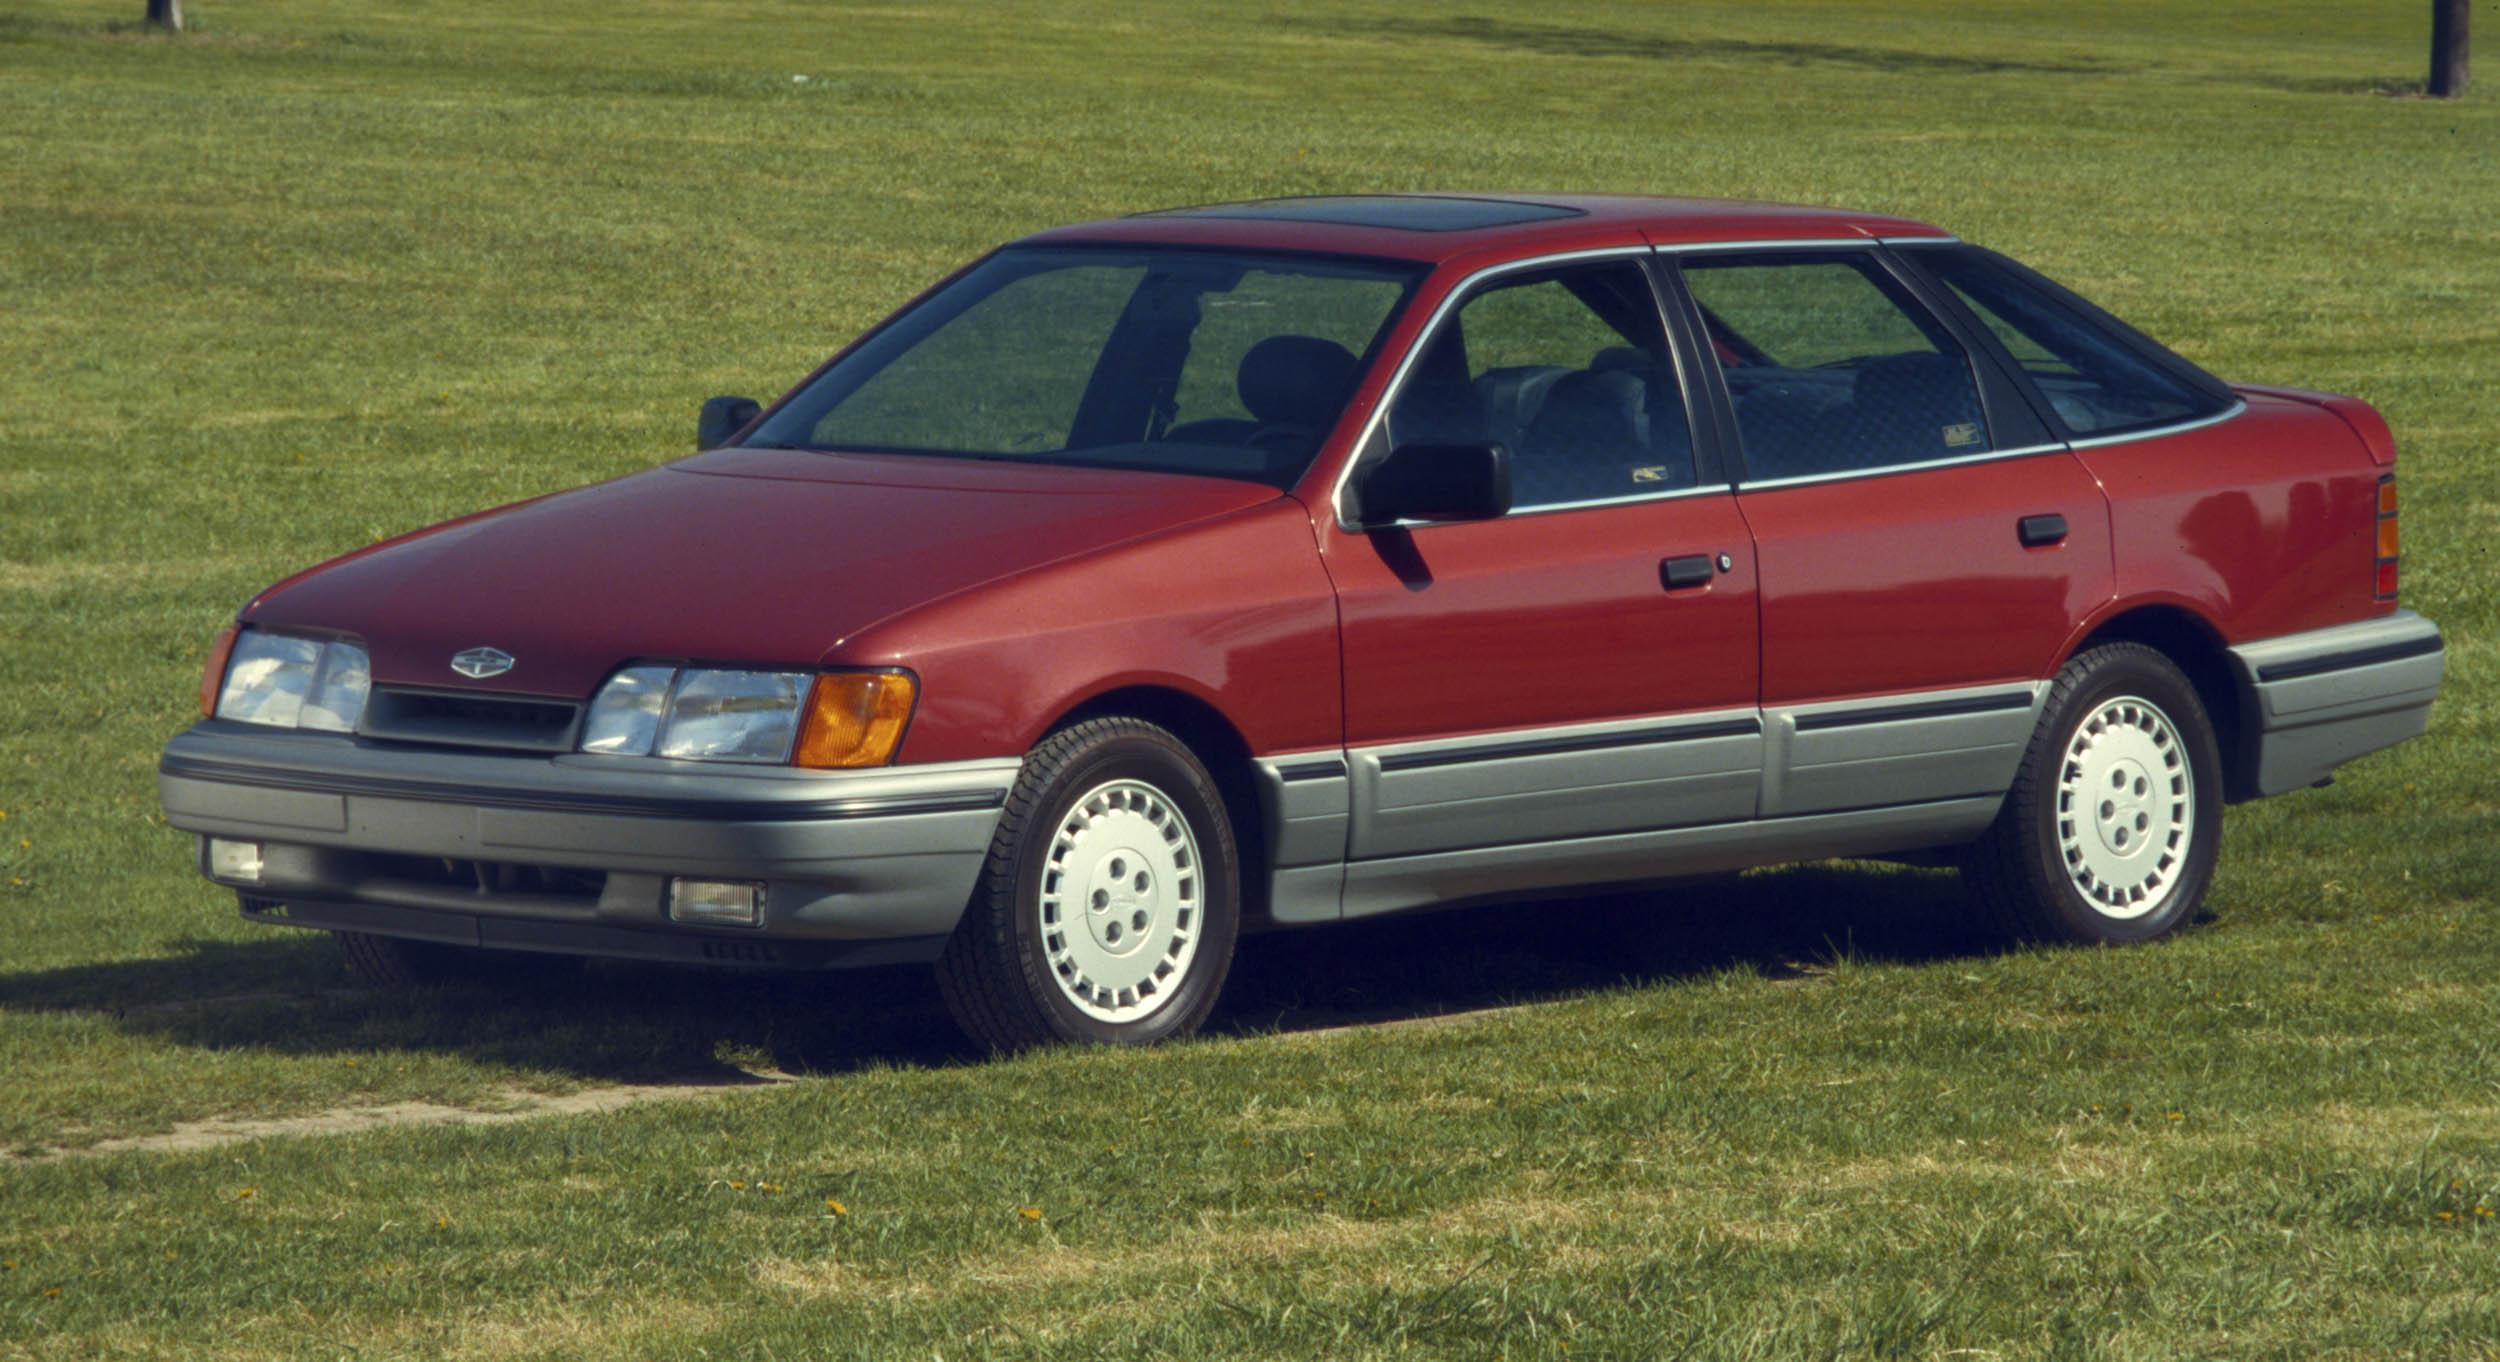 1988 Merkur Scorpio front 3/4